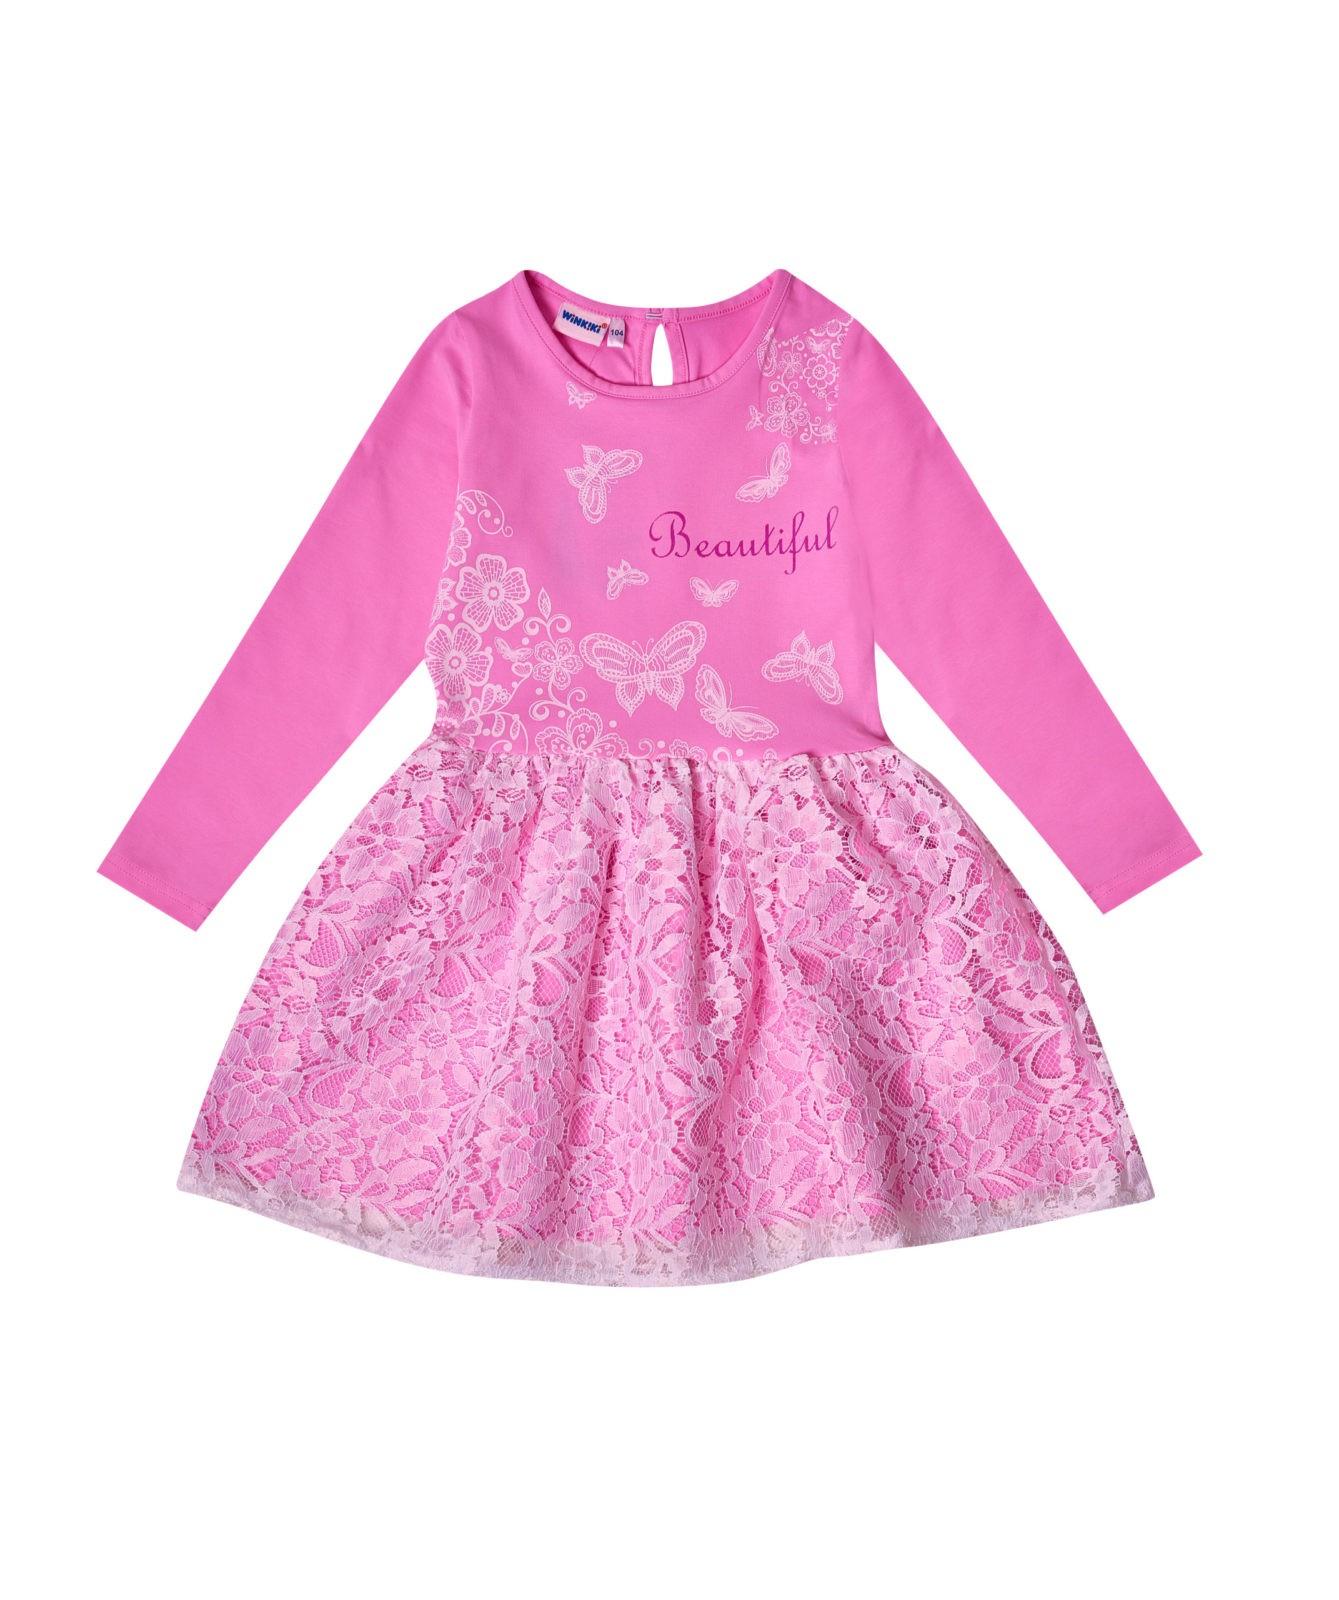 Dívčí šaty Beautiful Růžová/Bílá